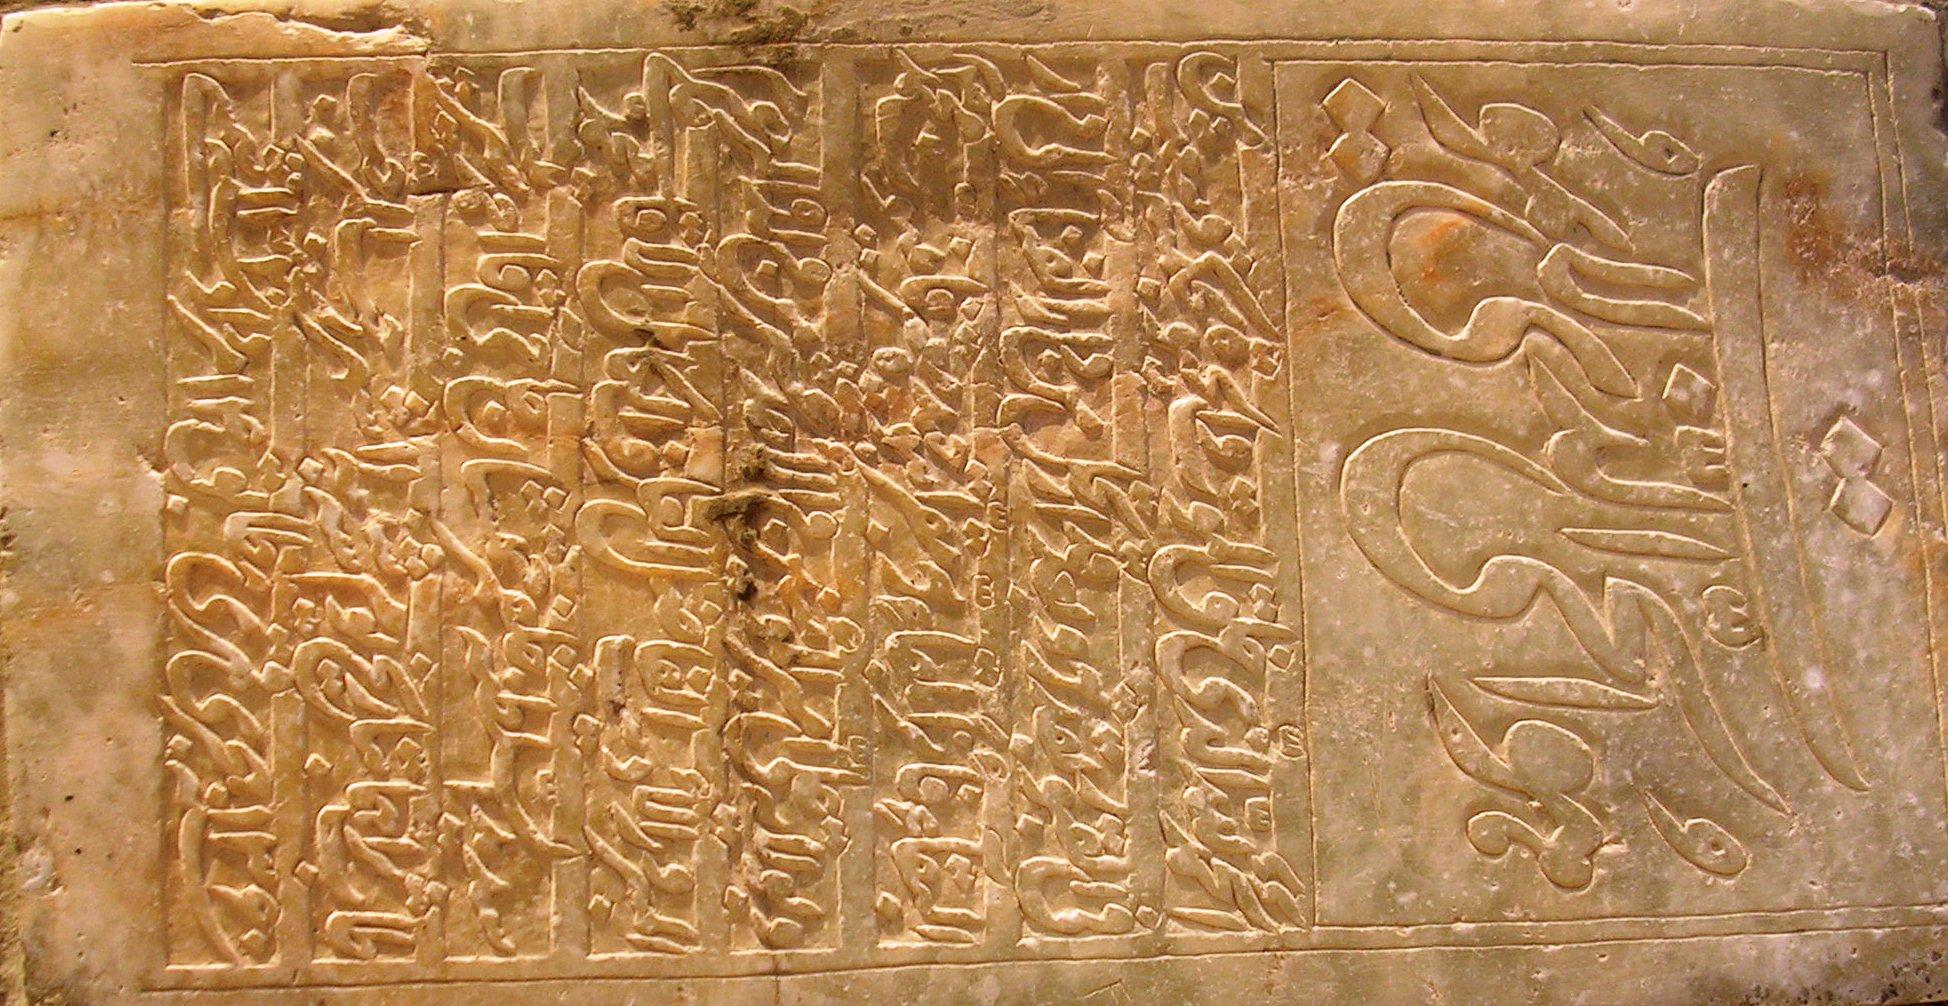 سنگ قبر سدیدالسلطنه